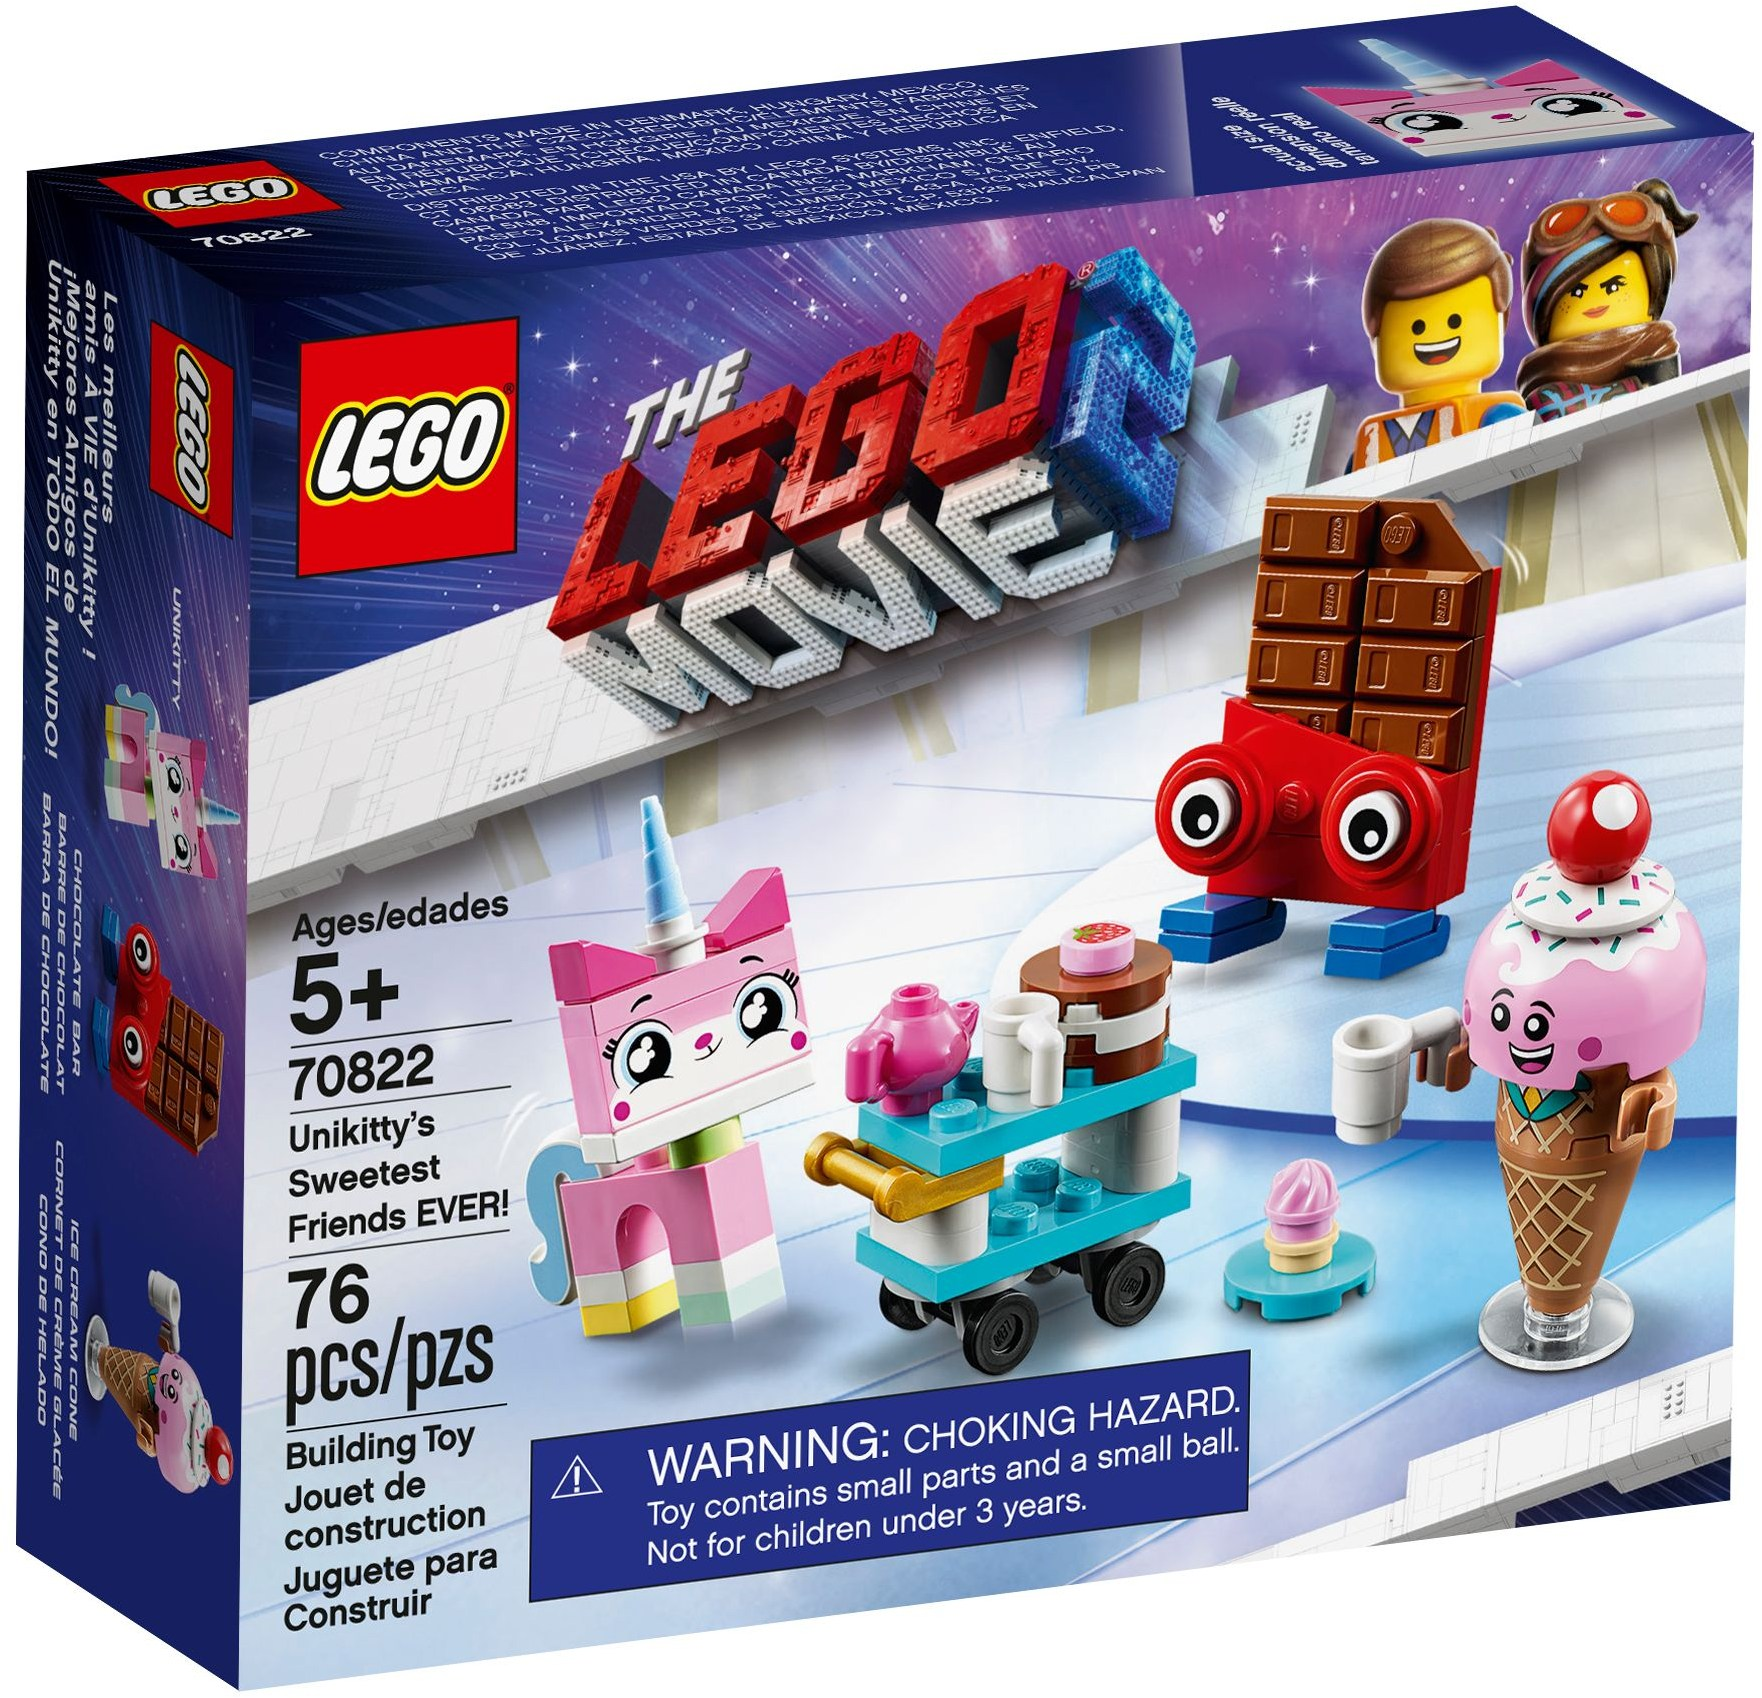 LEGO Ice Cream Cone mini fig New Minifigure 70822 Lego Movie 2 Sweetest Friends